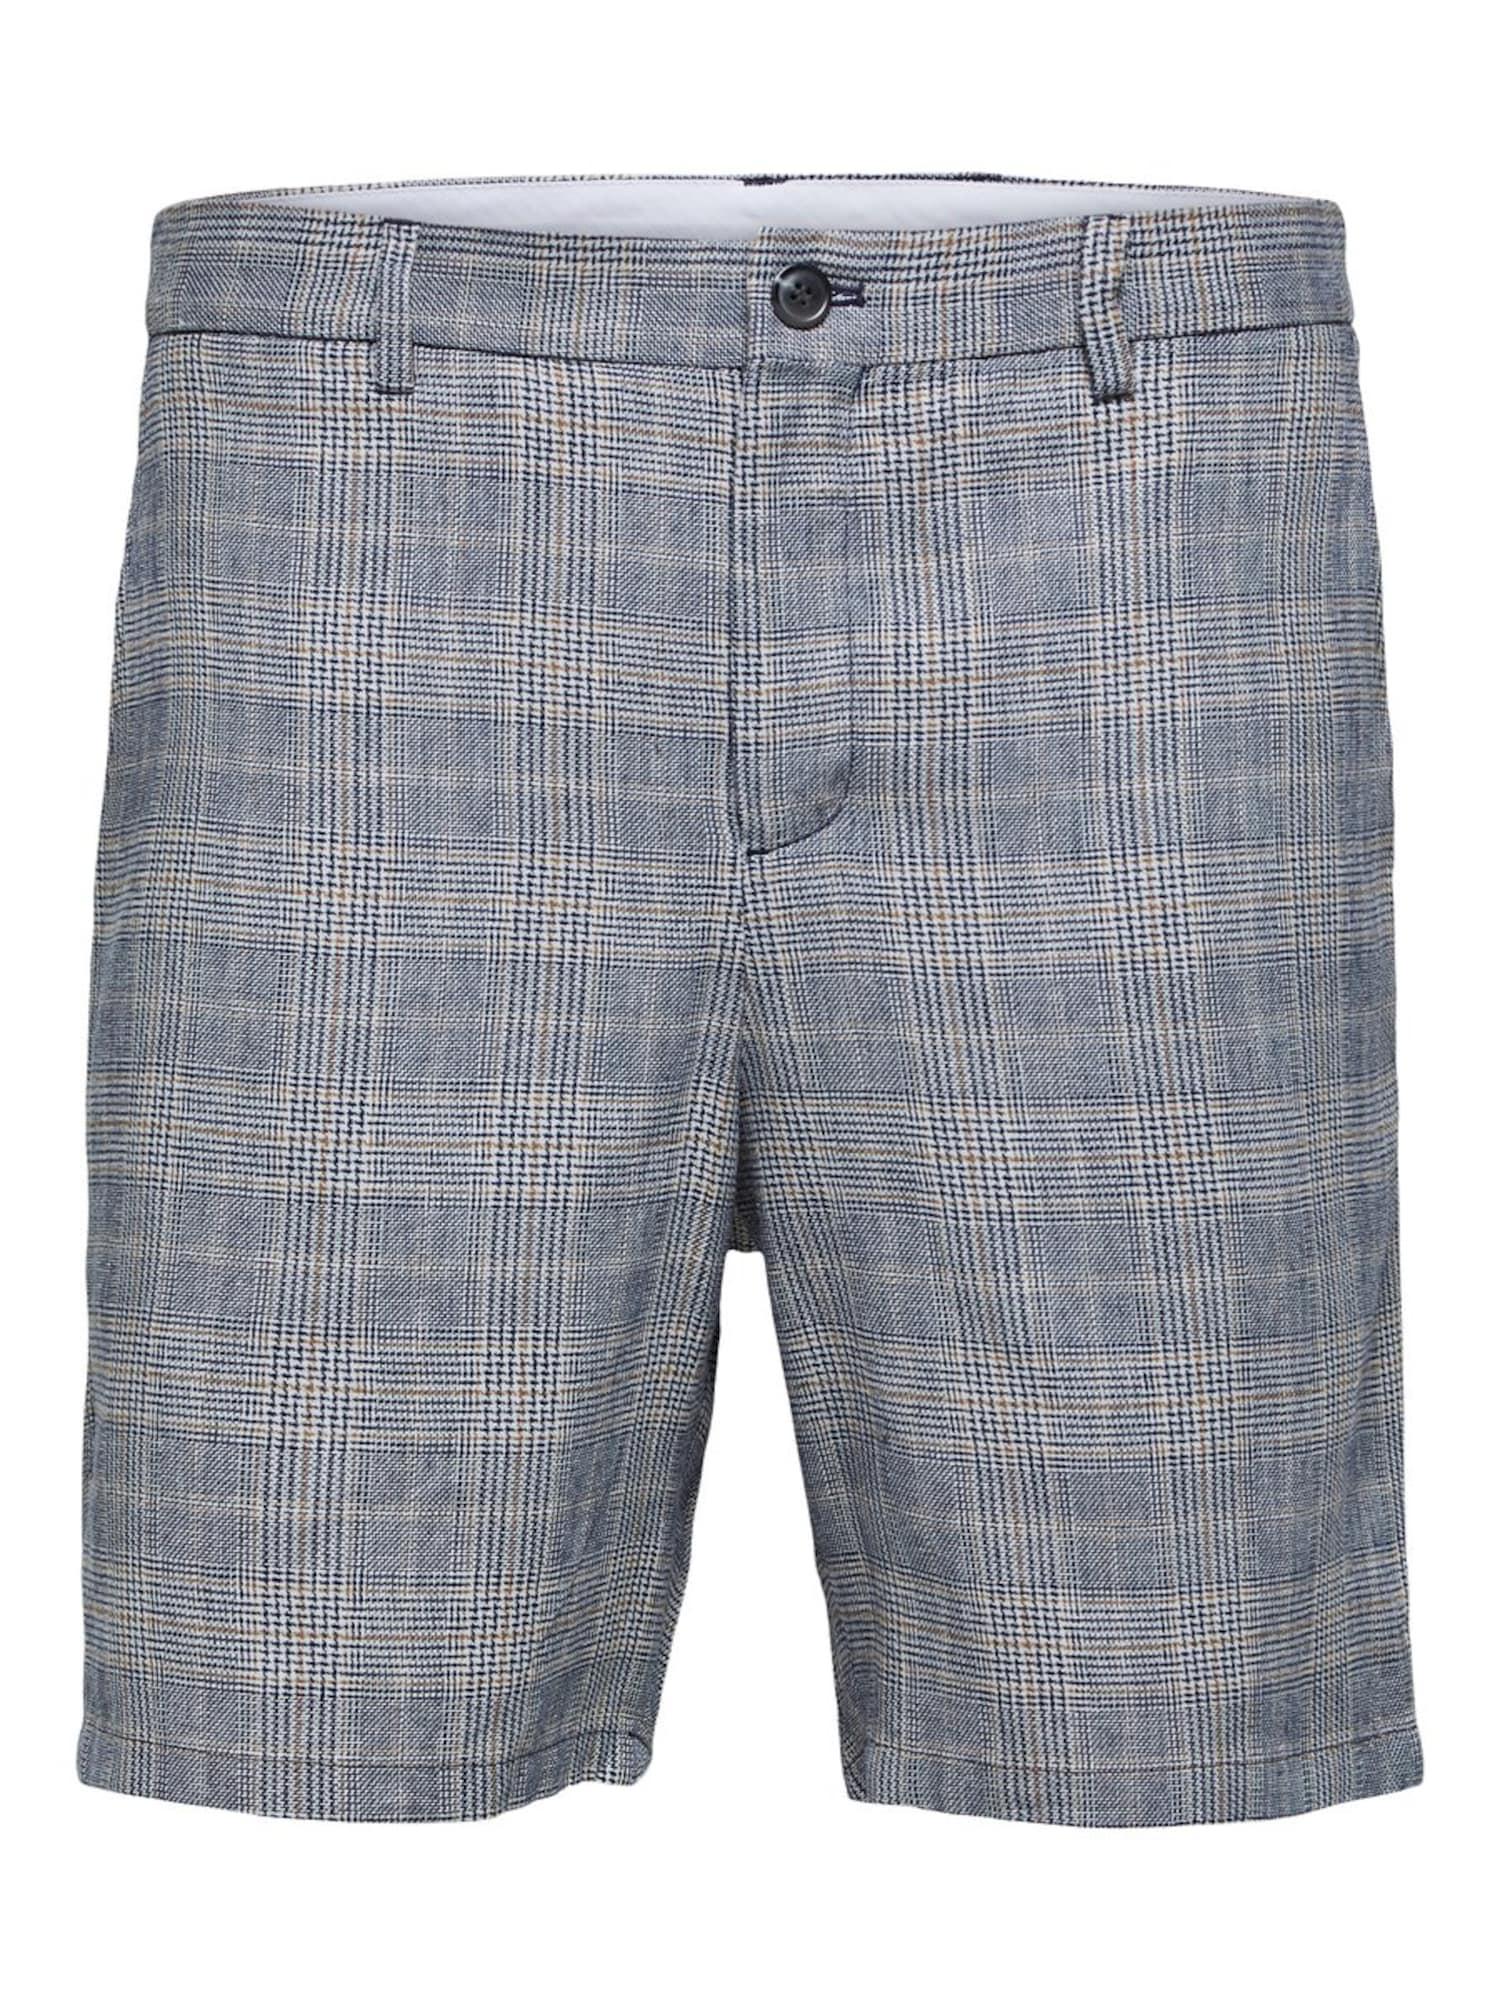 SELECTED HOMME Chino stiliaus kelnės tamsiai mėlyna / gelsvai pilka spalva / balta